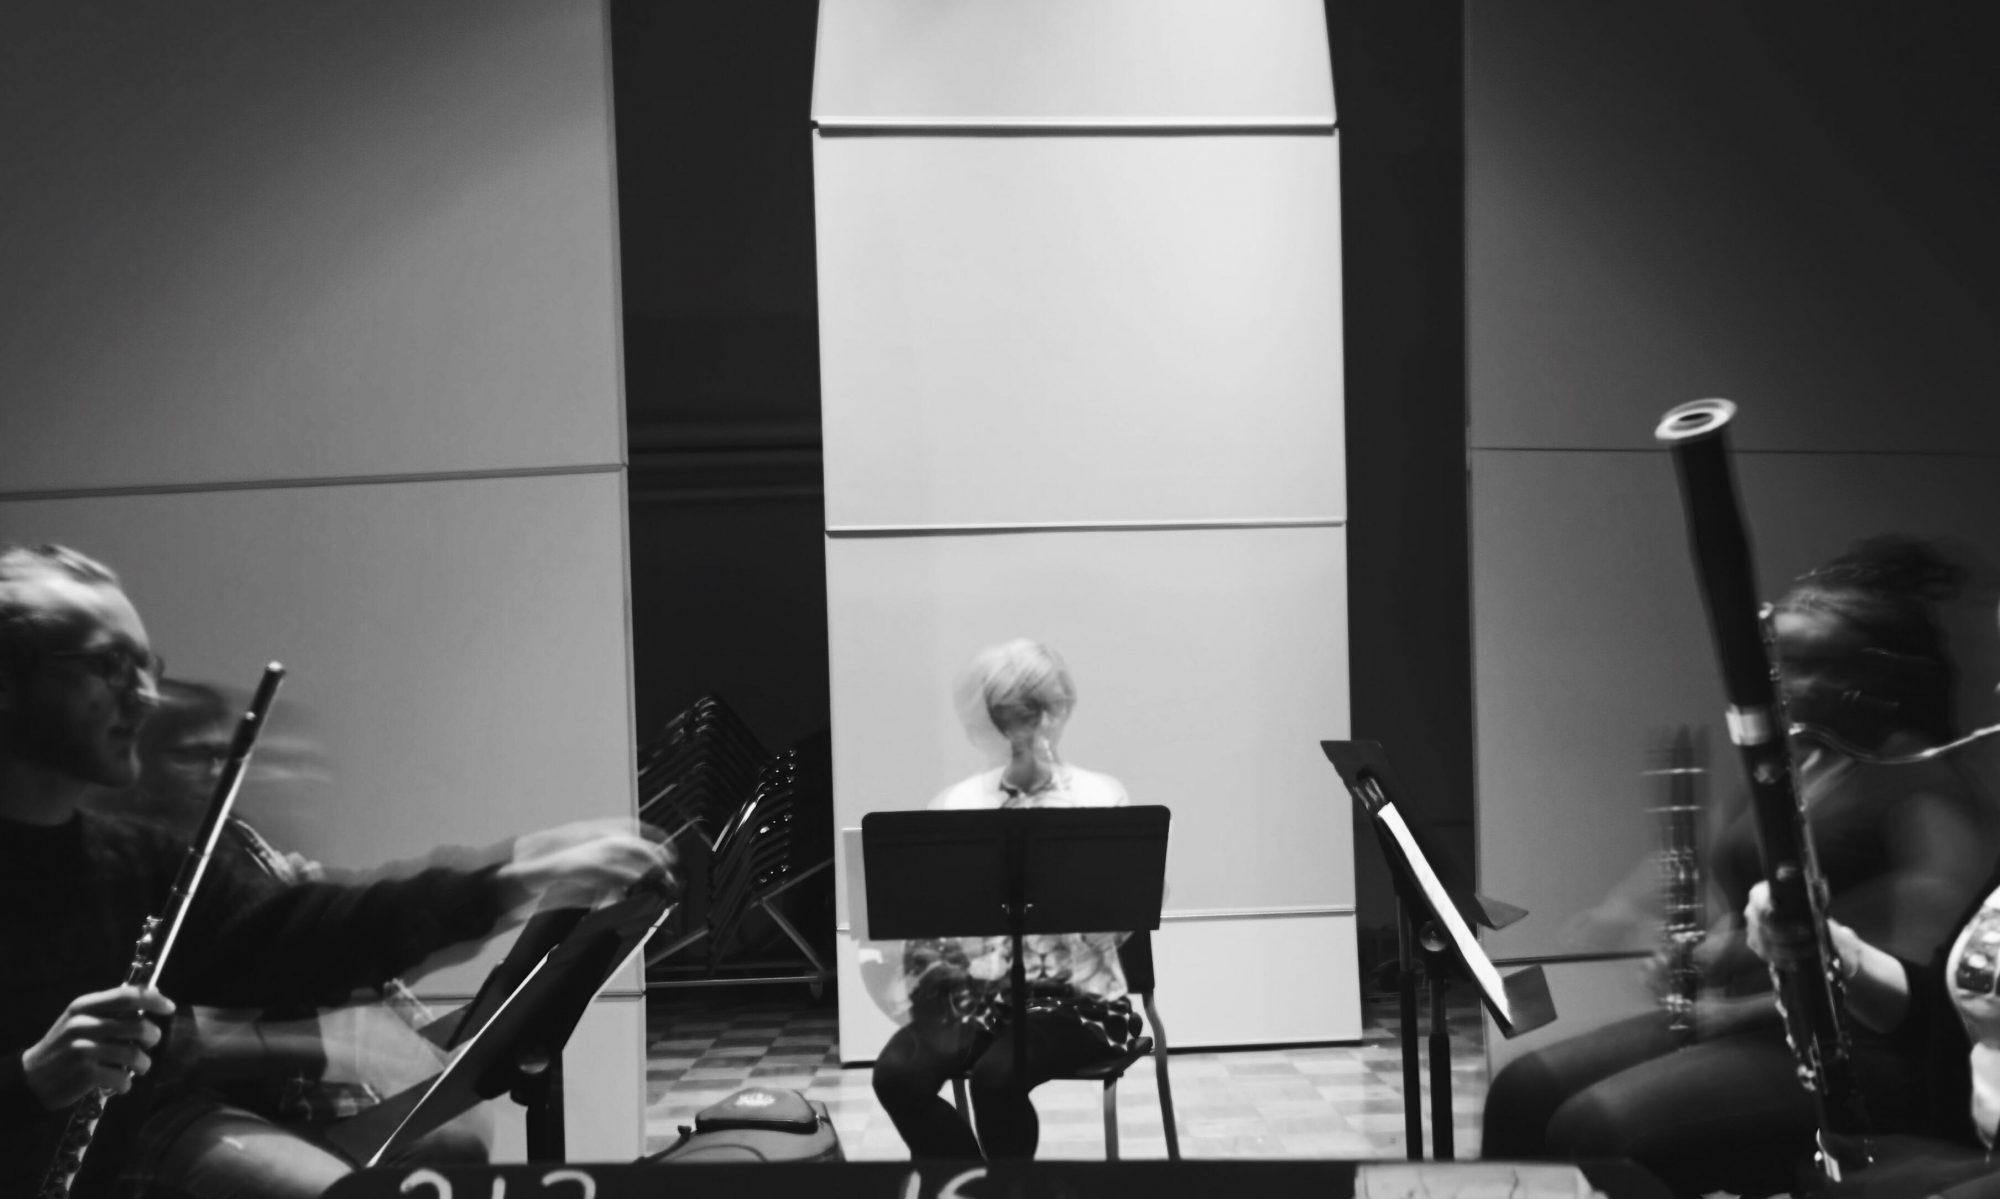 Cristian Larios | Composer